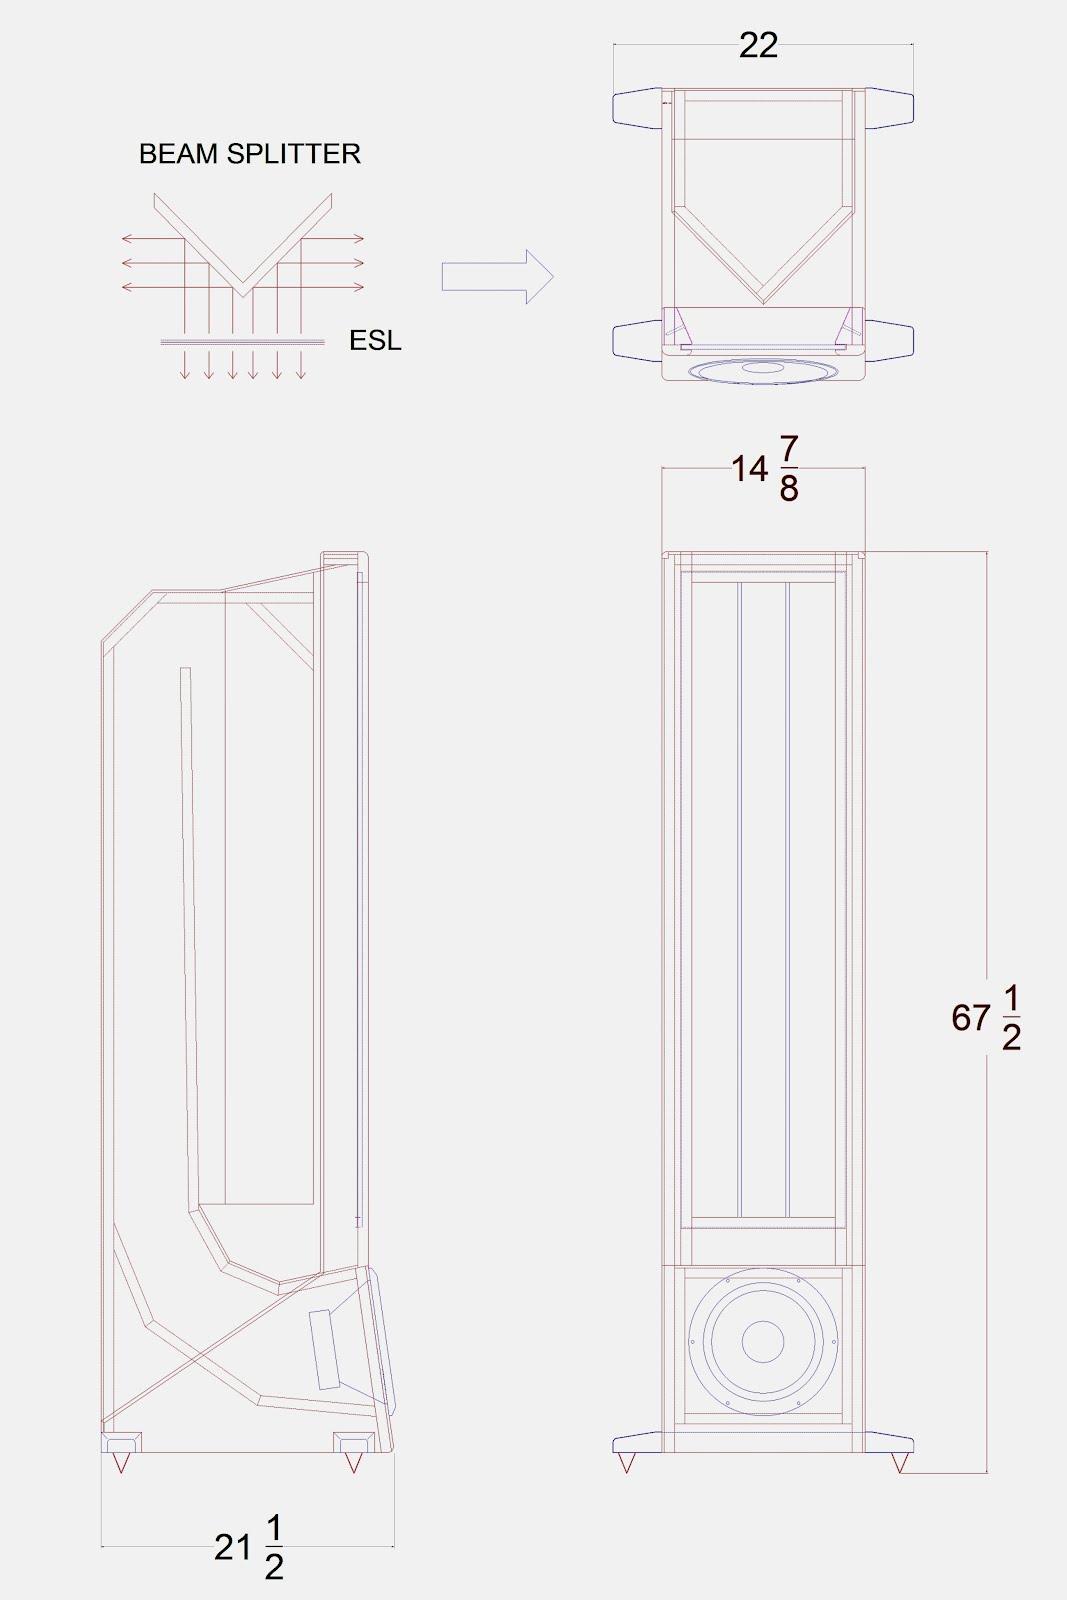 Beam-Splitter Transmission Line Cabinet  sc 1 st  Jazzman\u0027s DIY Electrostatic Loudspeaker Page & Jazzman\u0027s DIY Electrostatic Loudspeaker Page: Beam-Splitter ...